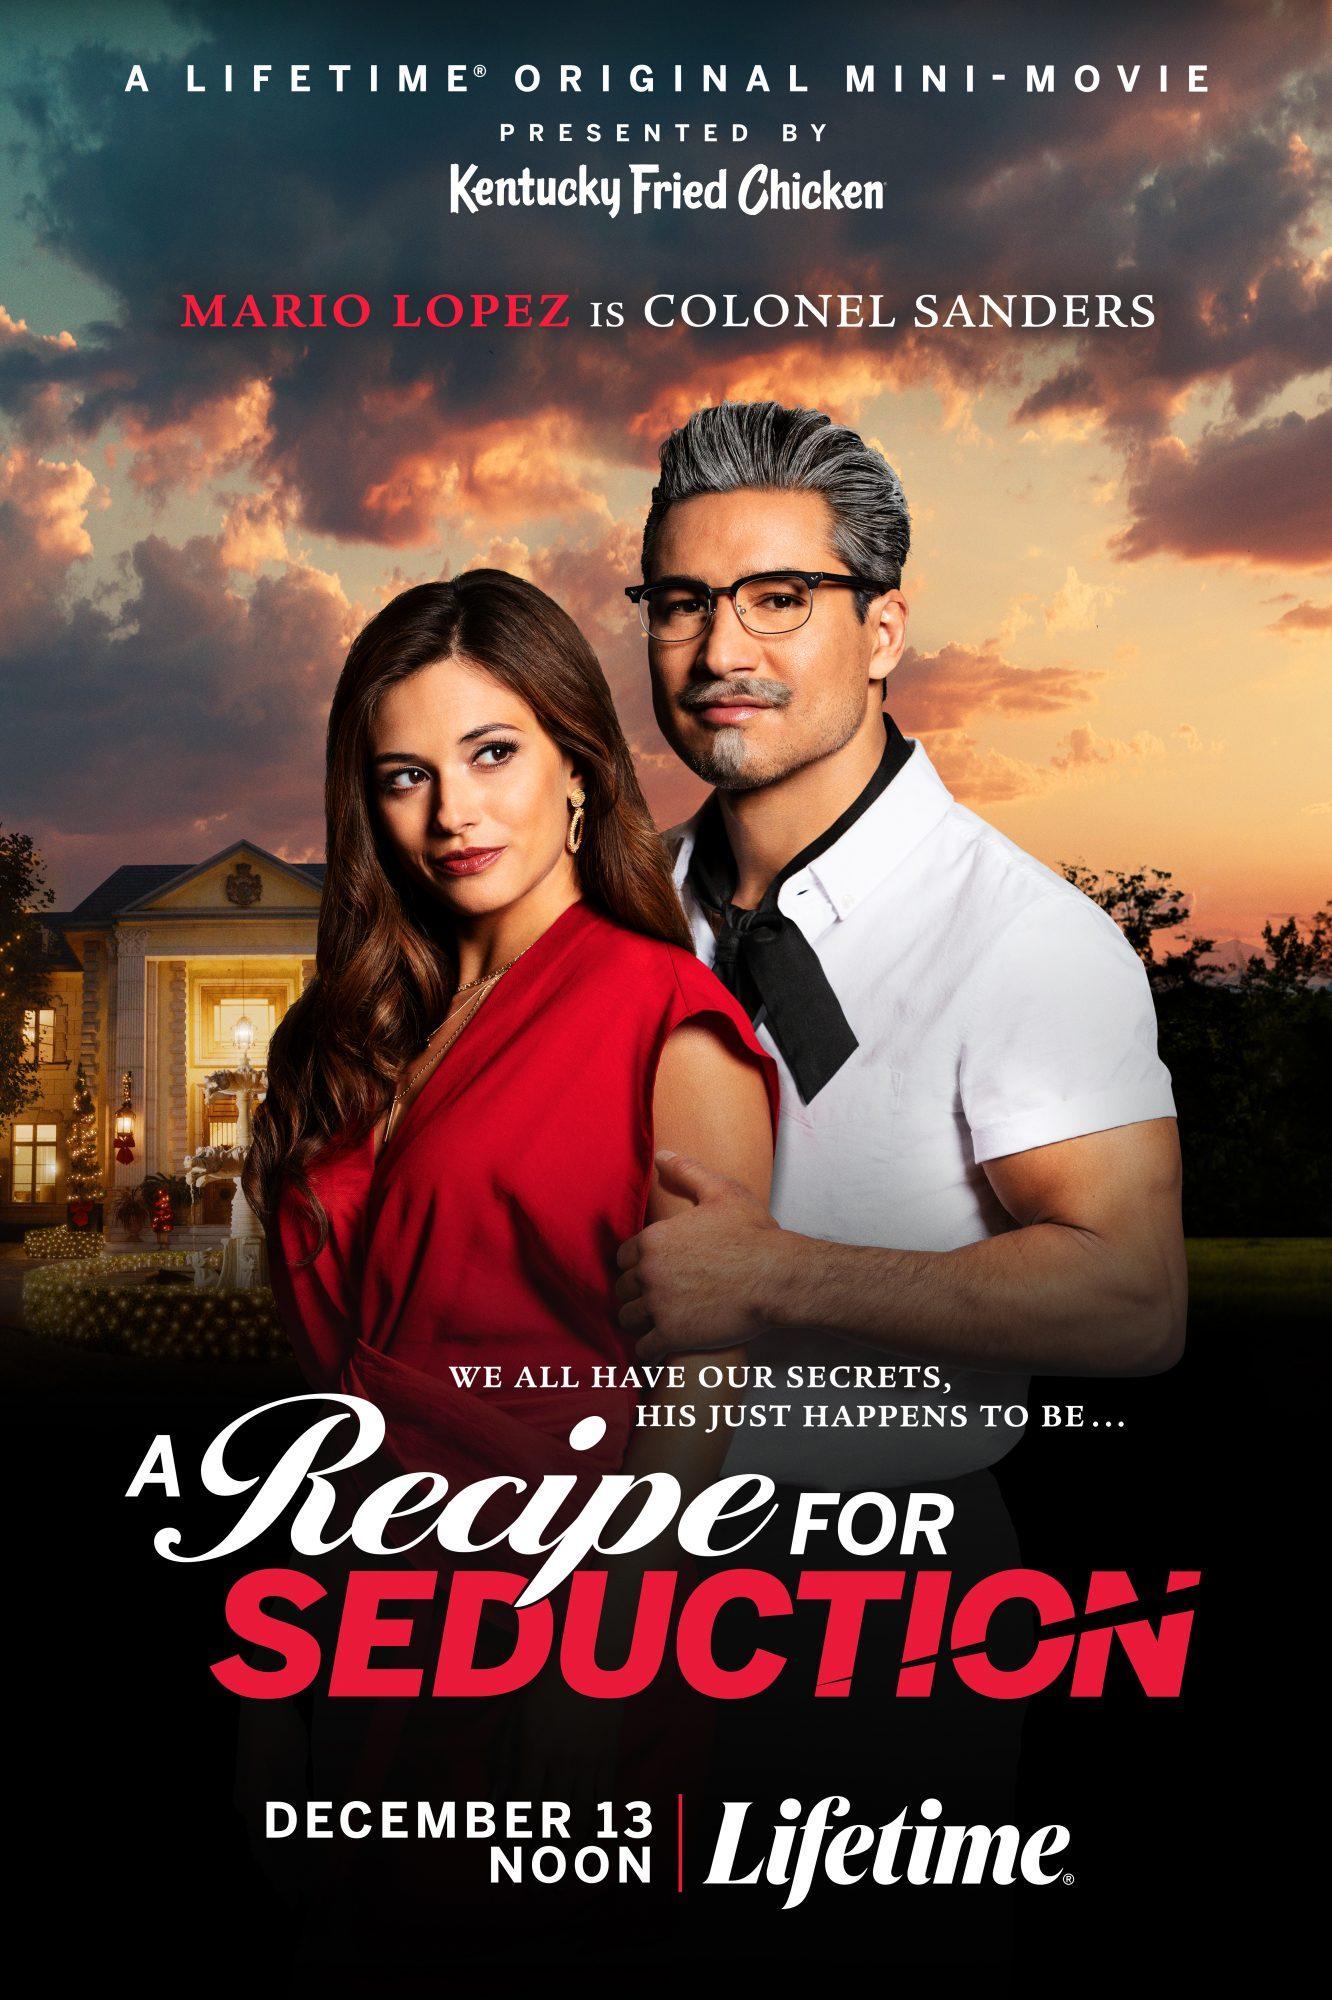 Mario Lopez - A Recipe For Seduction